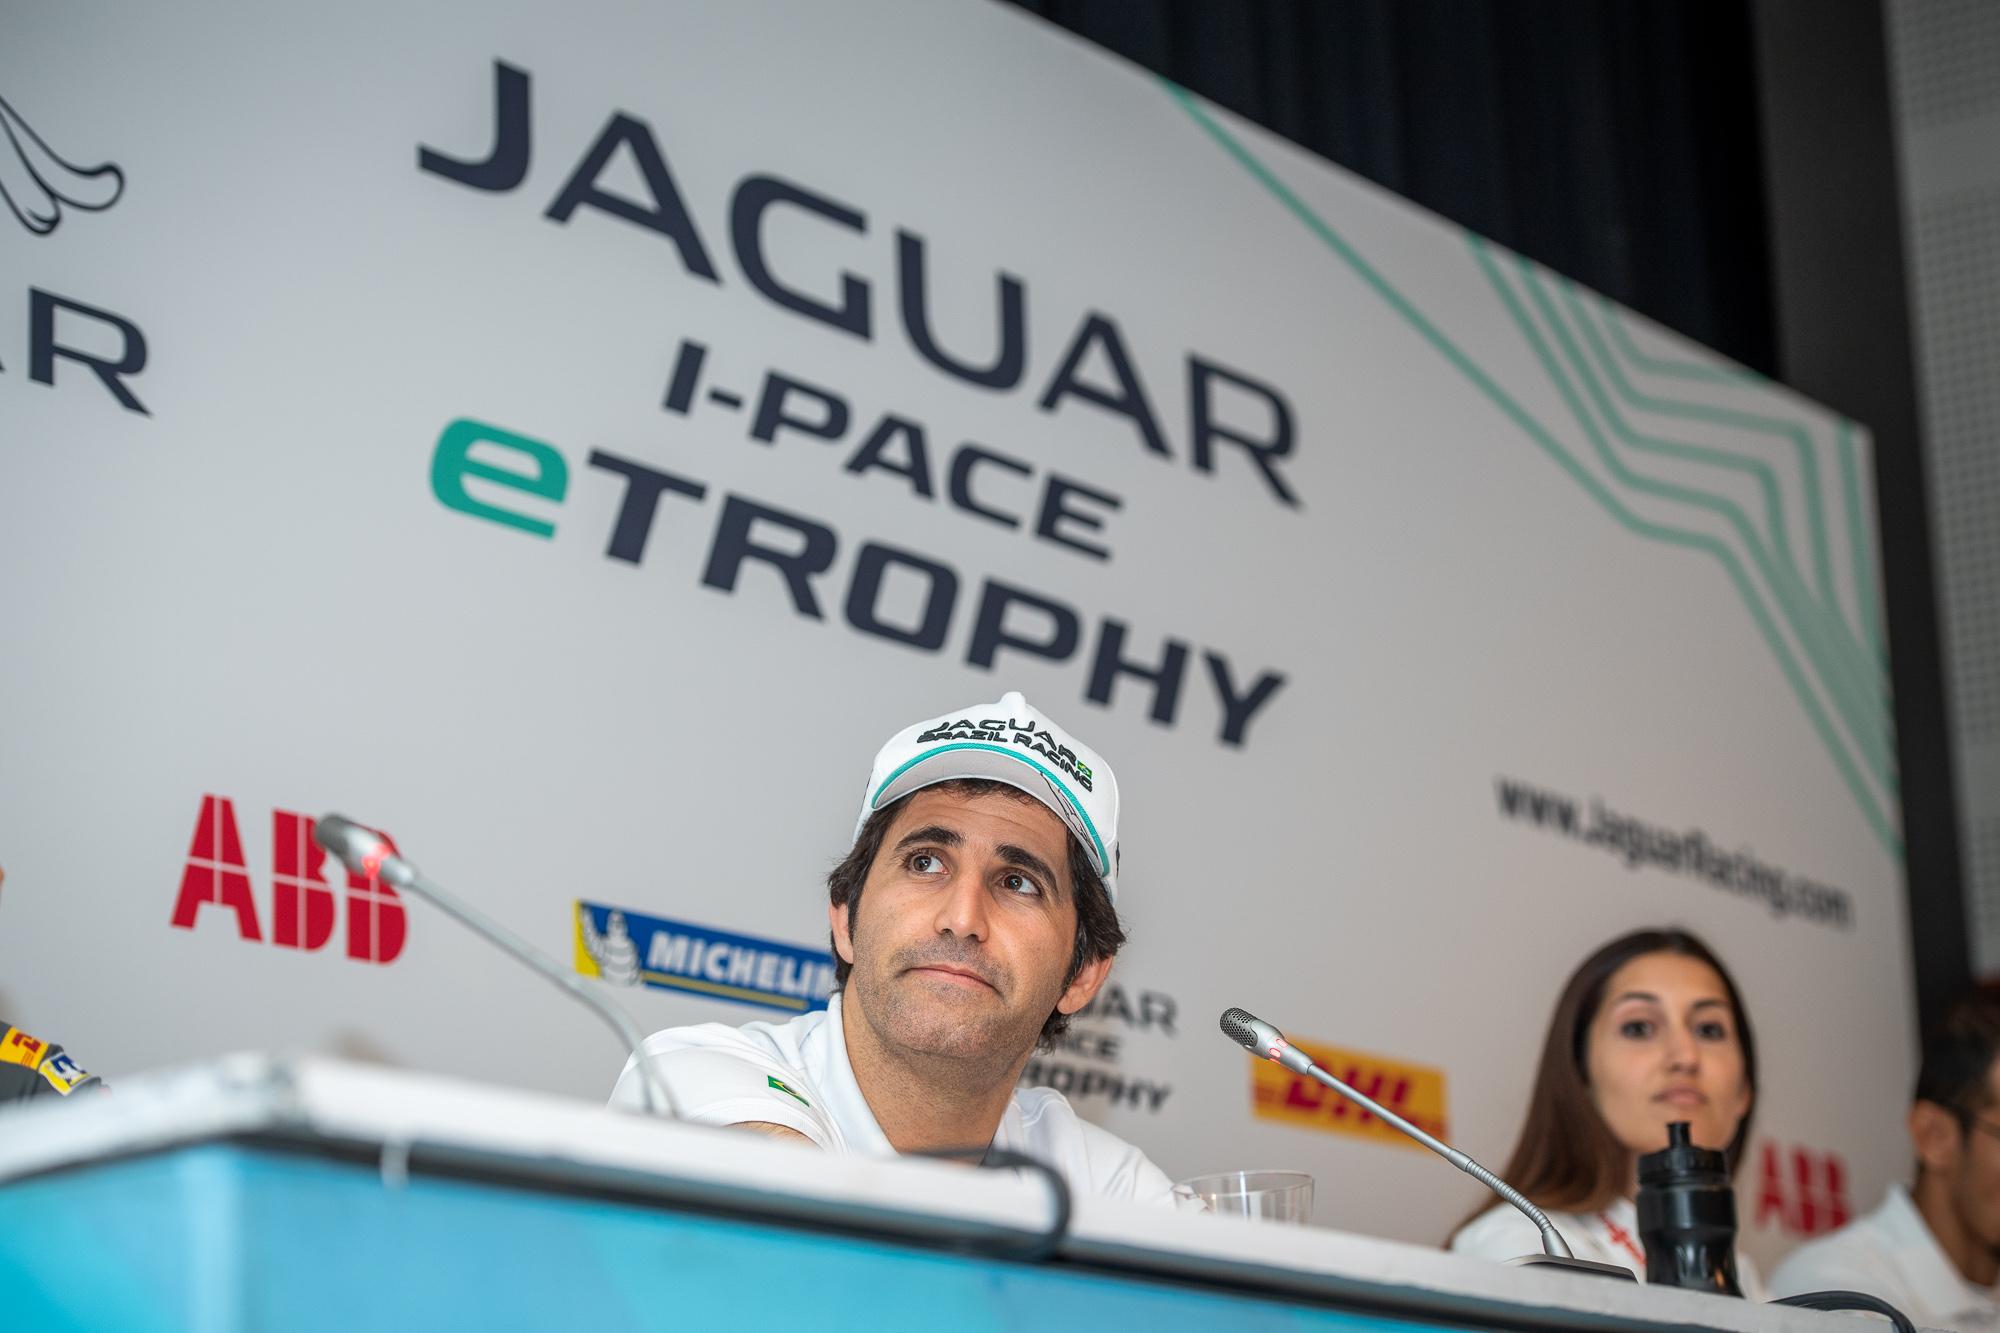 Jaguar_6.Paris_josemariodias_03004